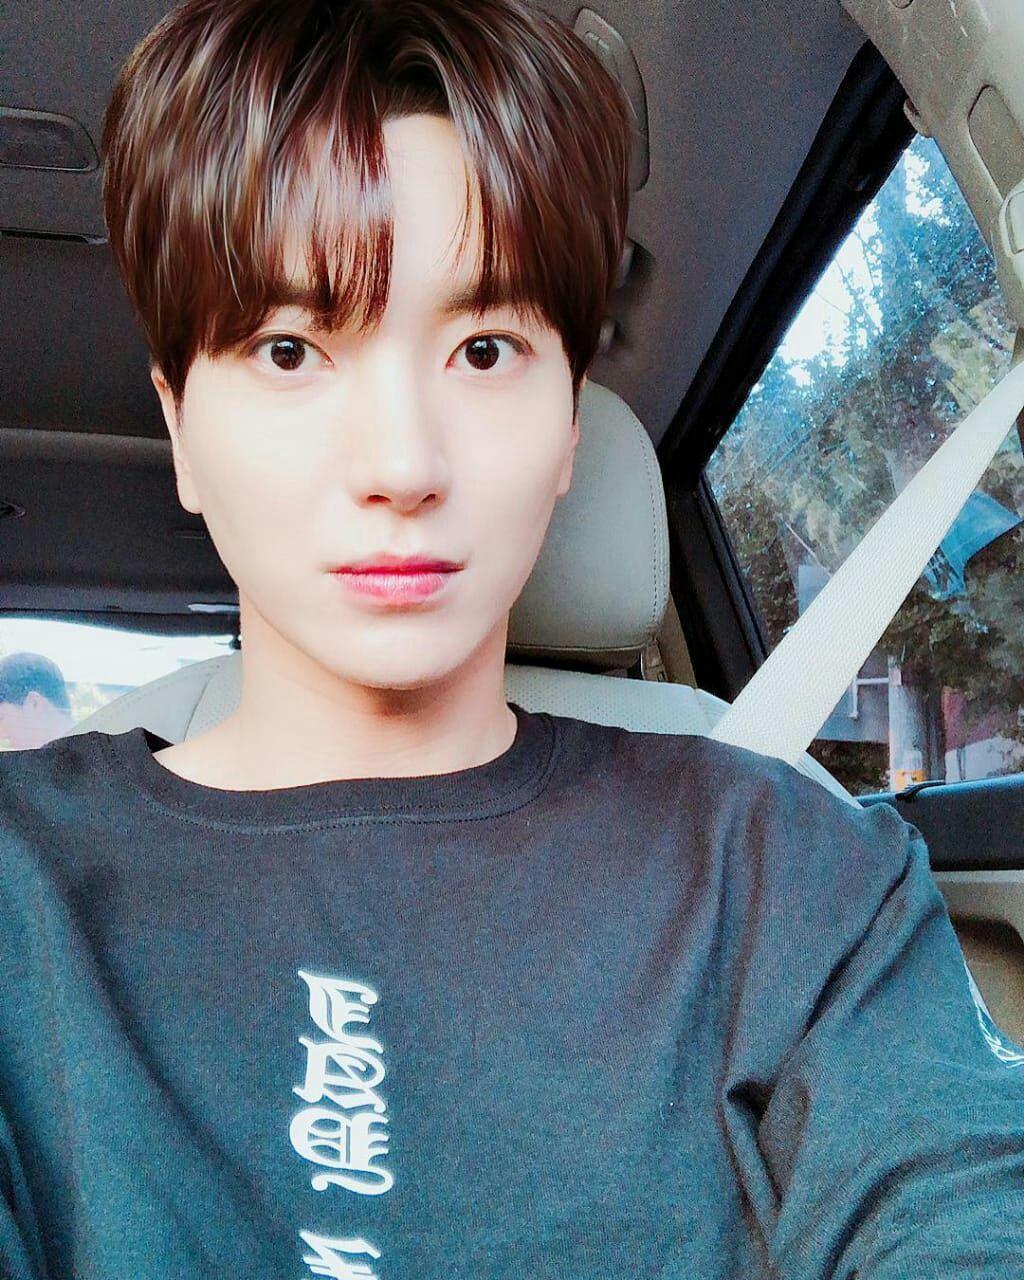 Un Amor De Verdad Leeteuk Y Zhoumi Leeteuk Idols Coreanos Super Junior